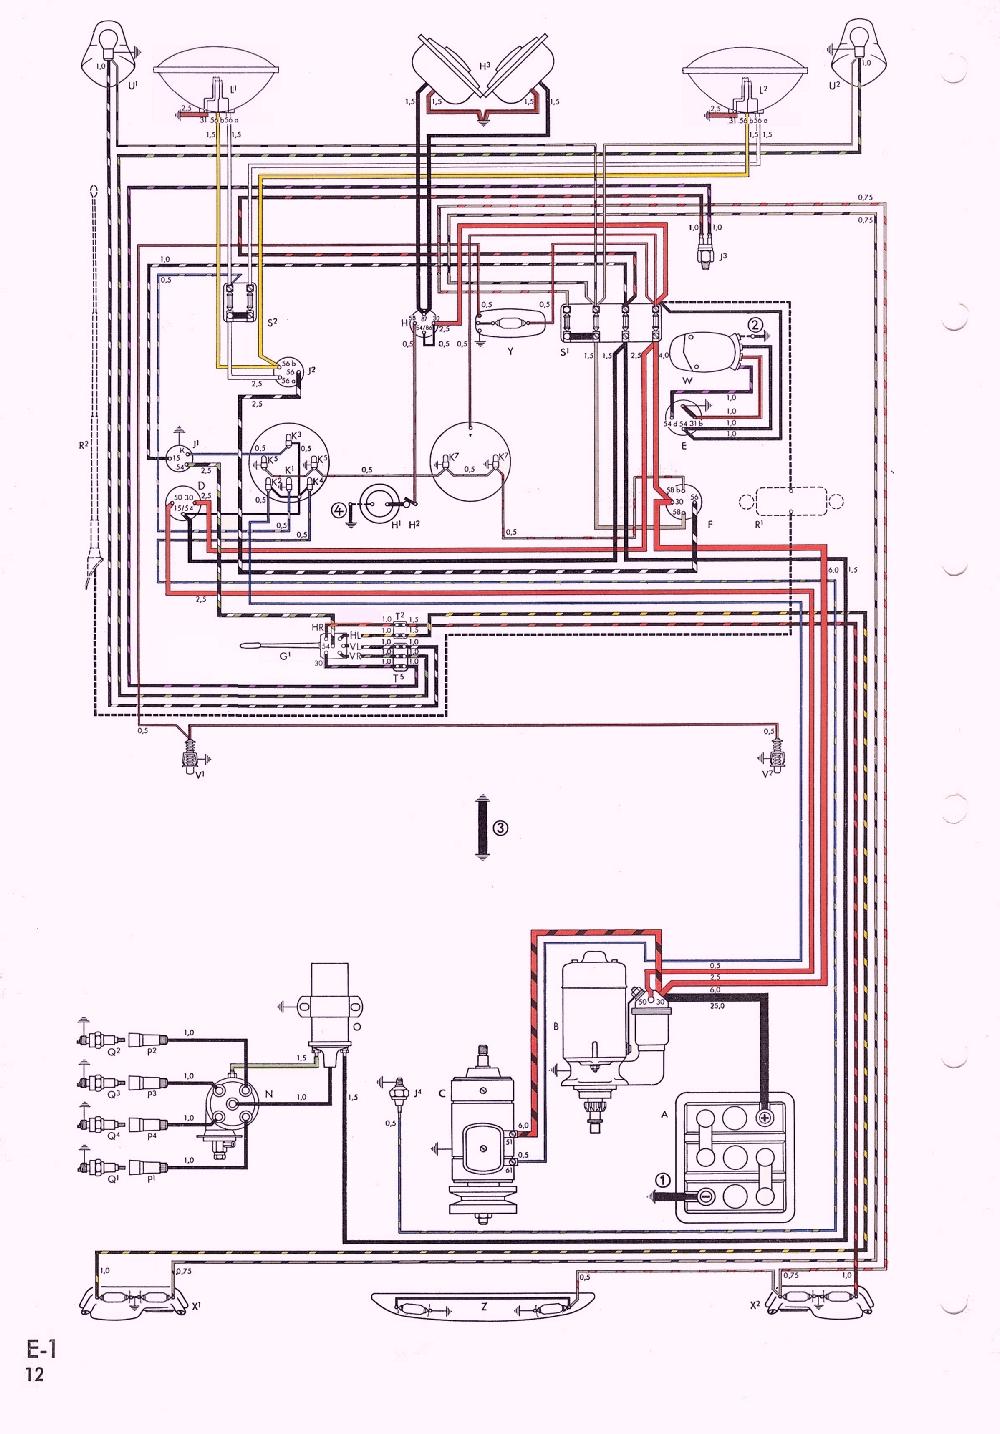 Km 4951 Diagram Moreover 1967 Vw Karmann Ghia Wiring Diagram On 69 Vw Ghia Schematic Wiring